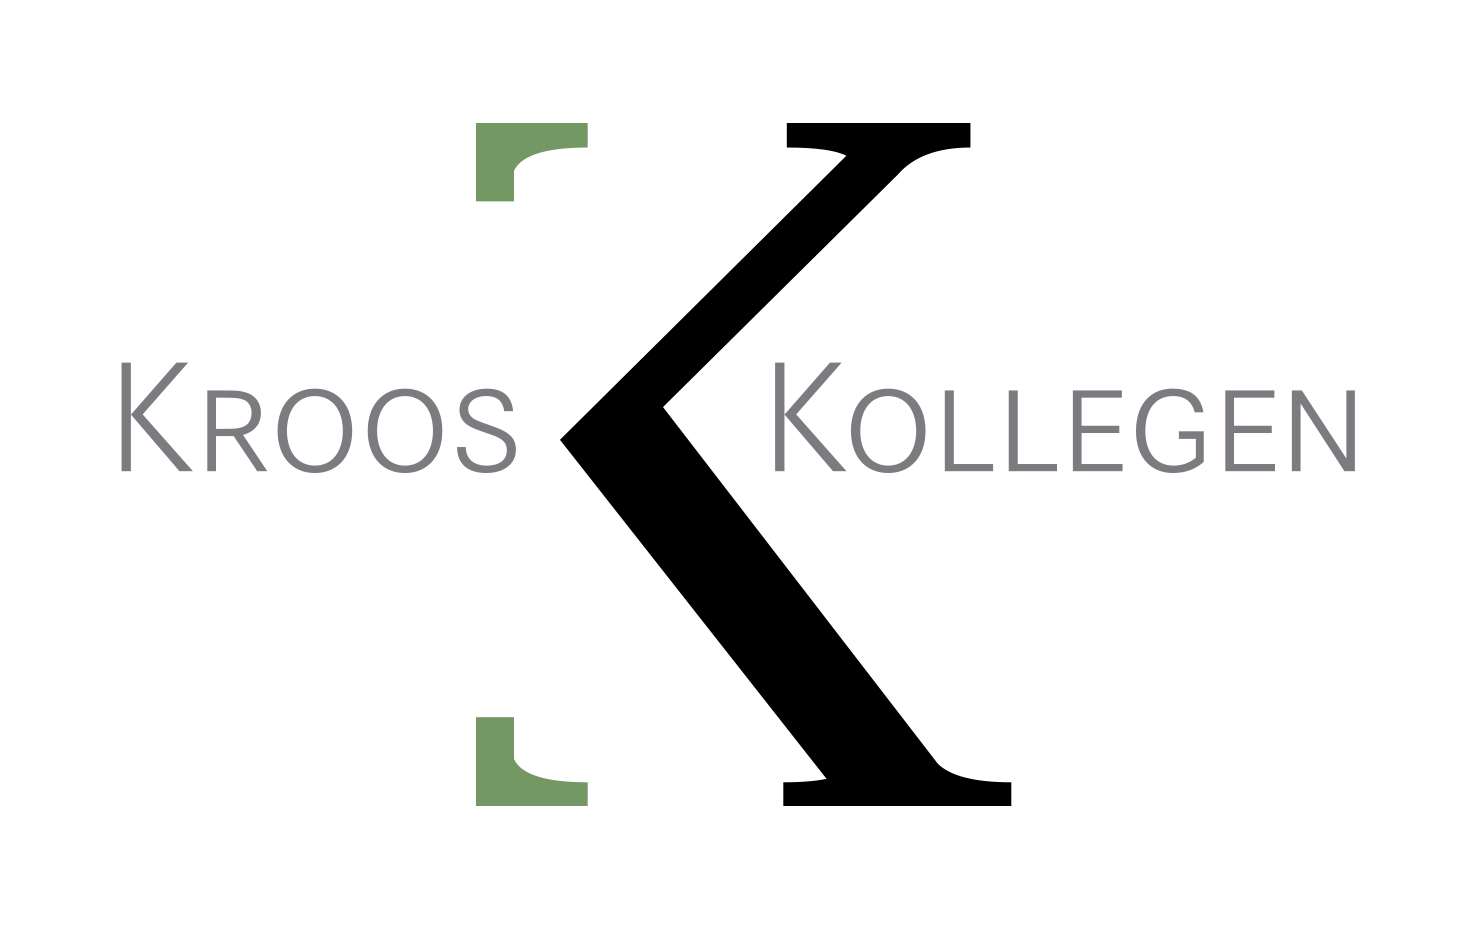 https://kroos-kollegen.de/wp-content/uploads/2020/02/KK-LOGO-LARGE.png